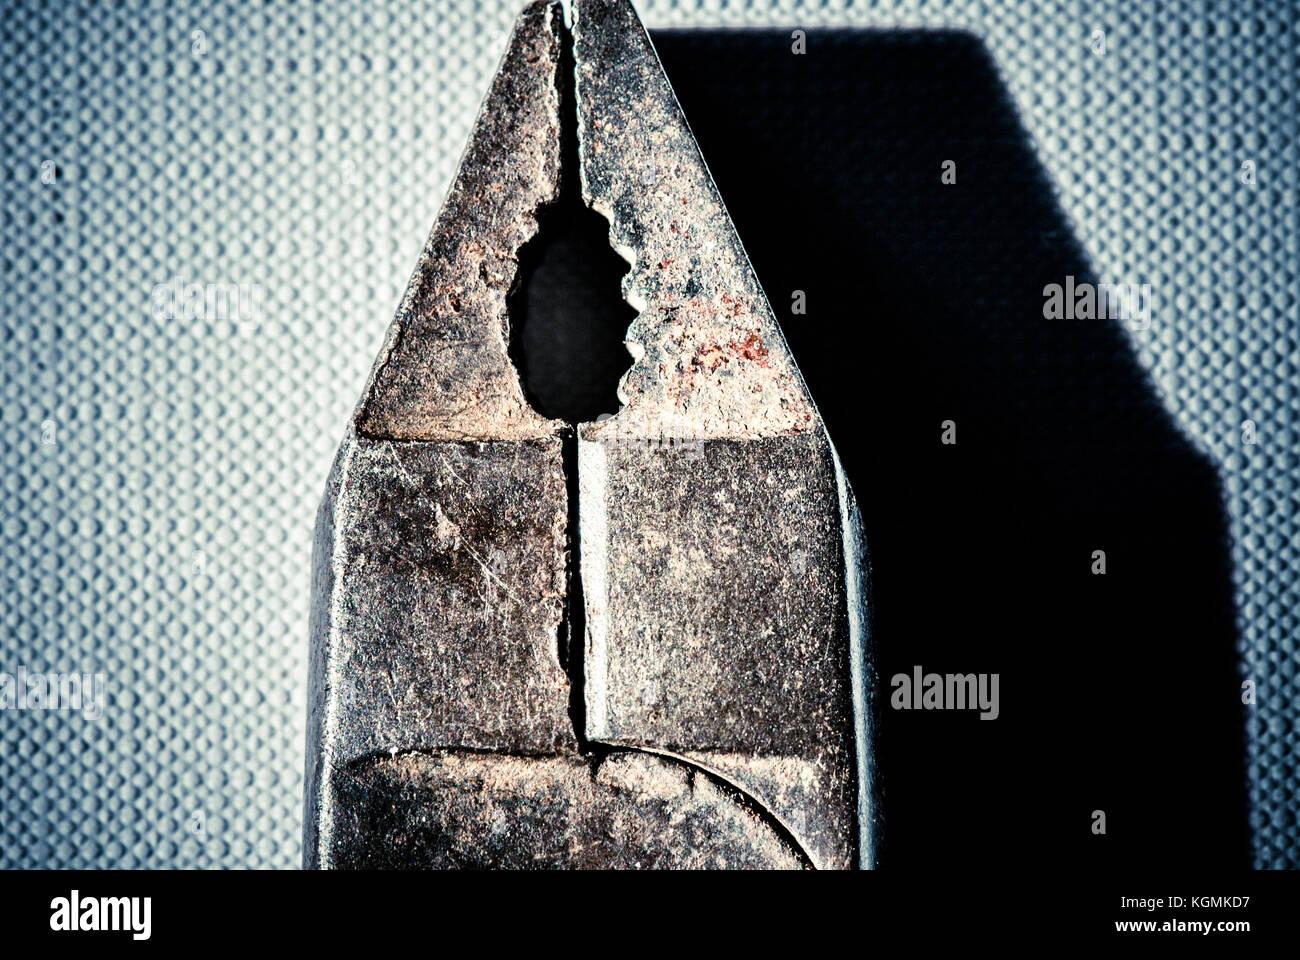 iron nipper over canvas - still life wallpaper - Stock Image